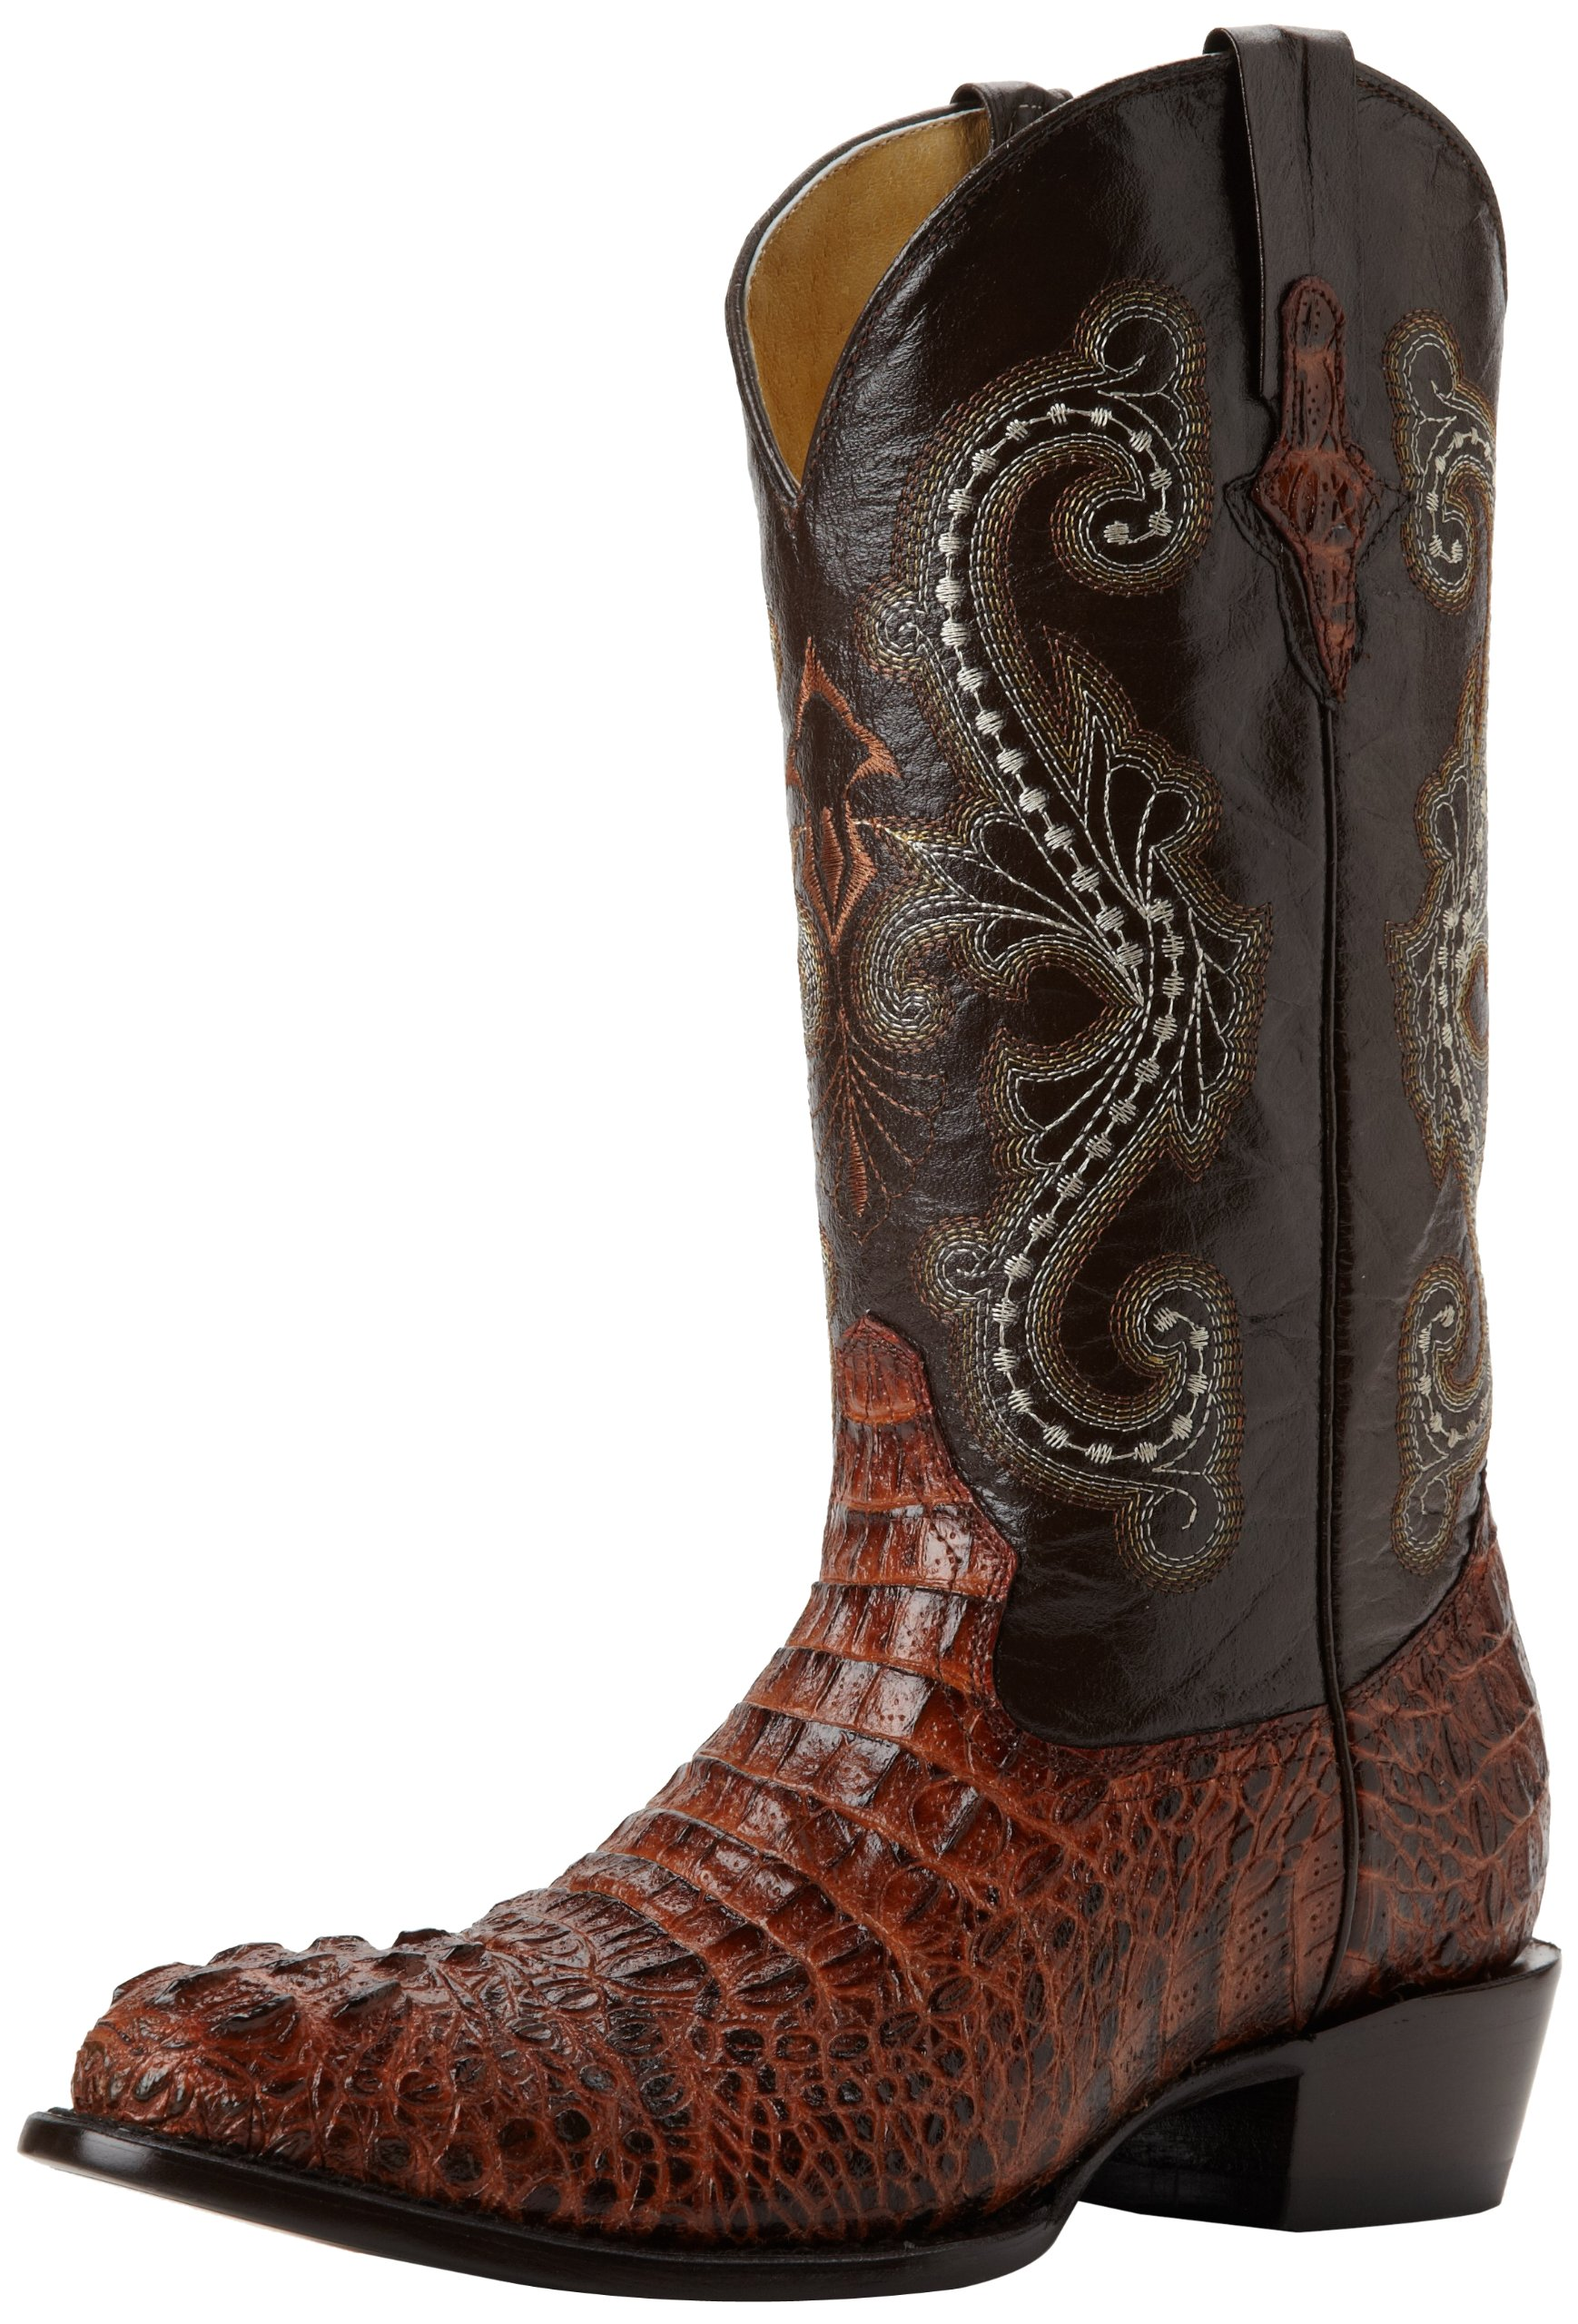 Crocodile Cowboy Boots 0846648028101/